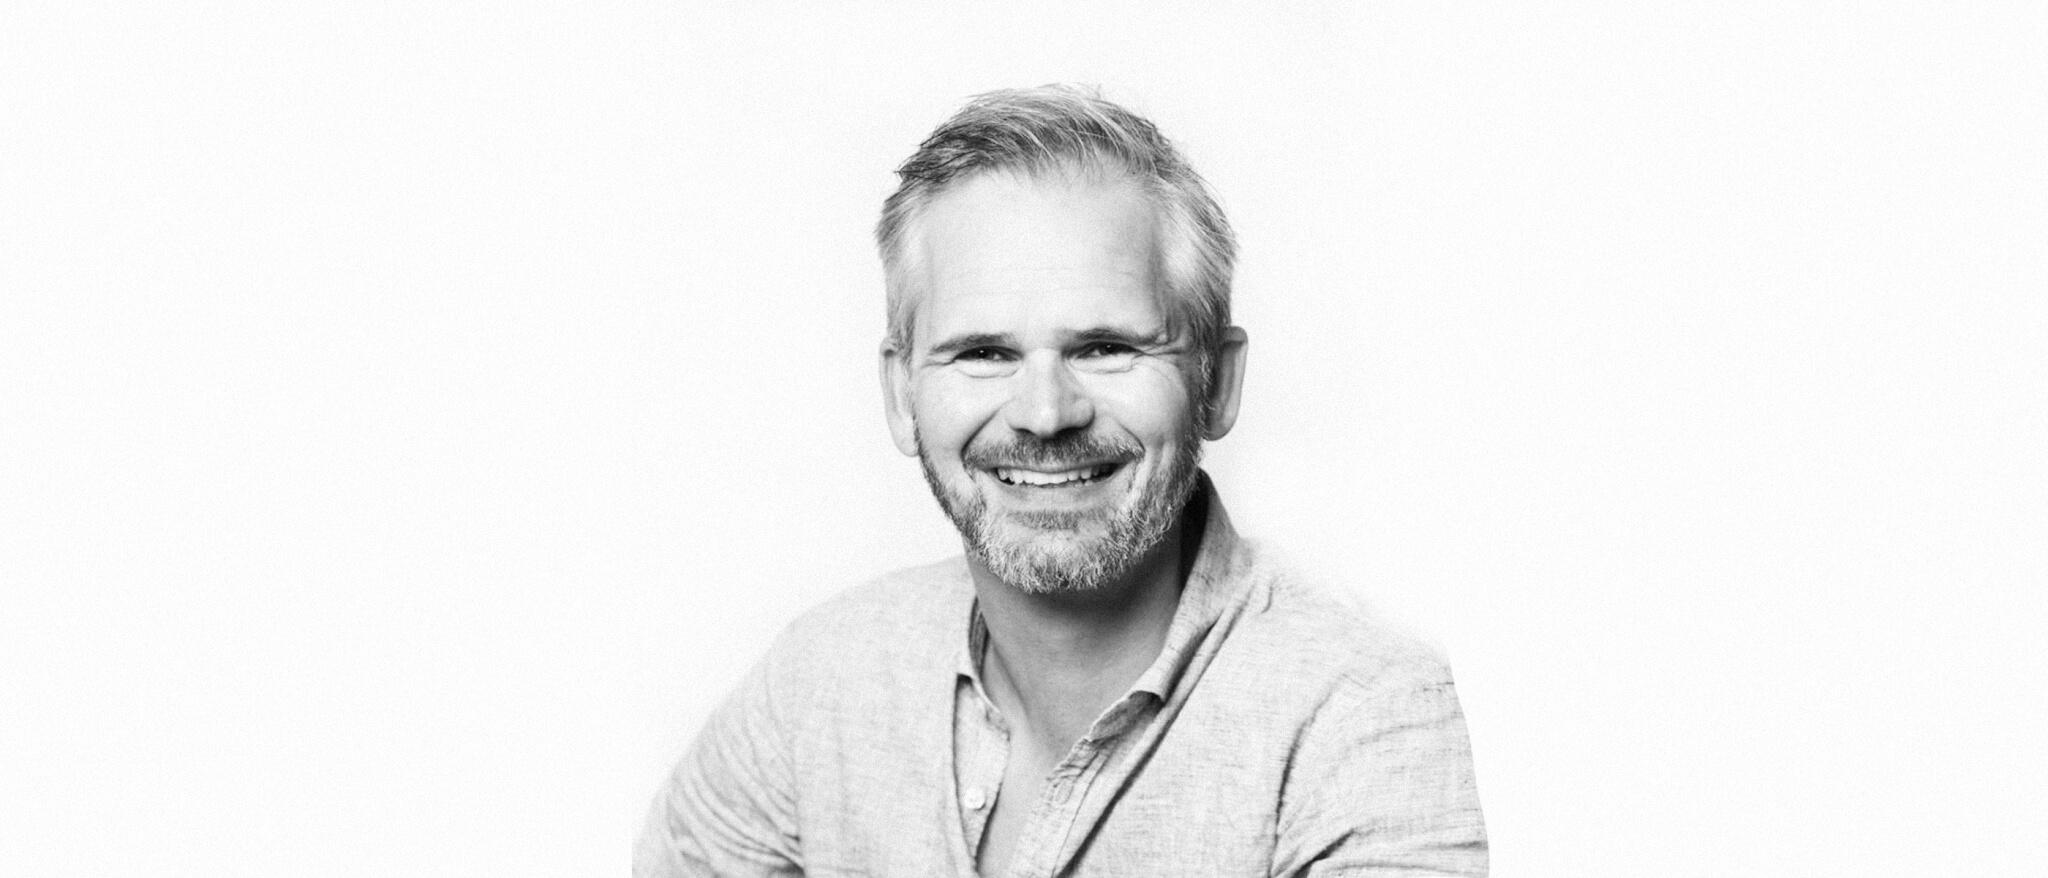 Marcel Fokkema